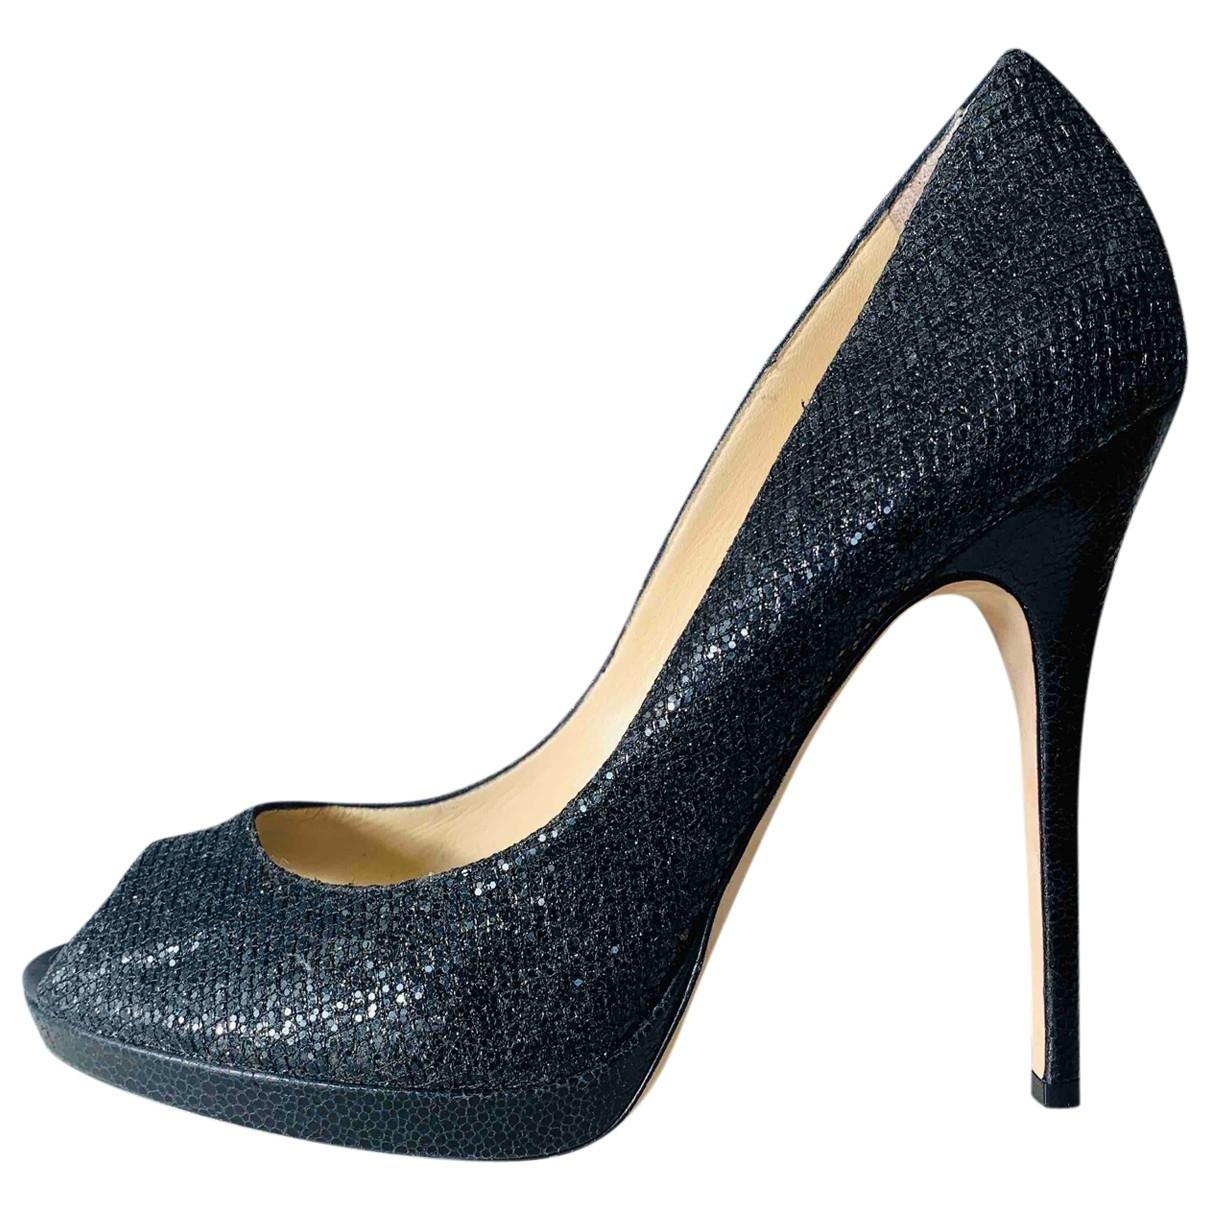 Jimmy Choo \N Black Glitter Heels for Women 40 EU